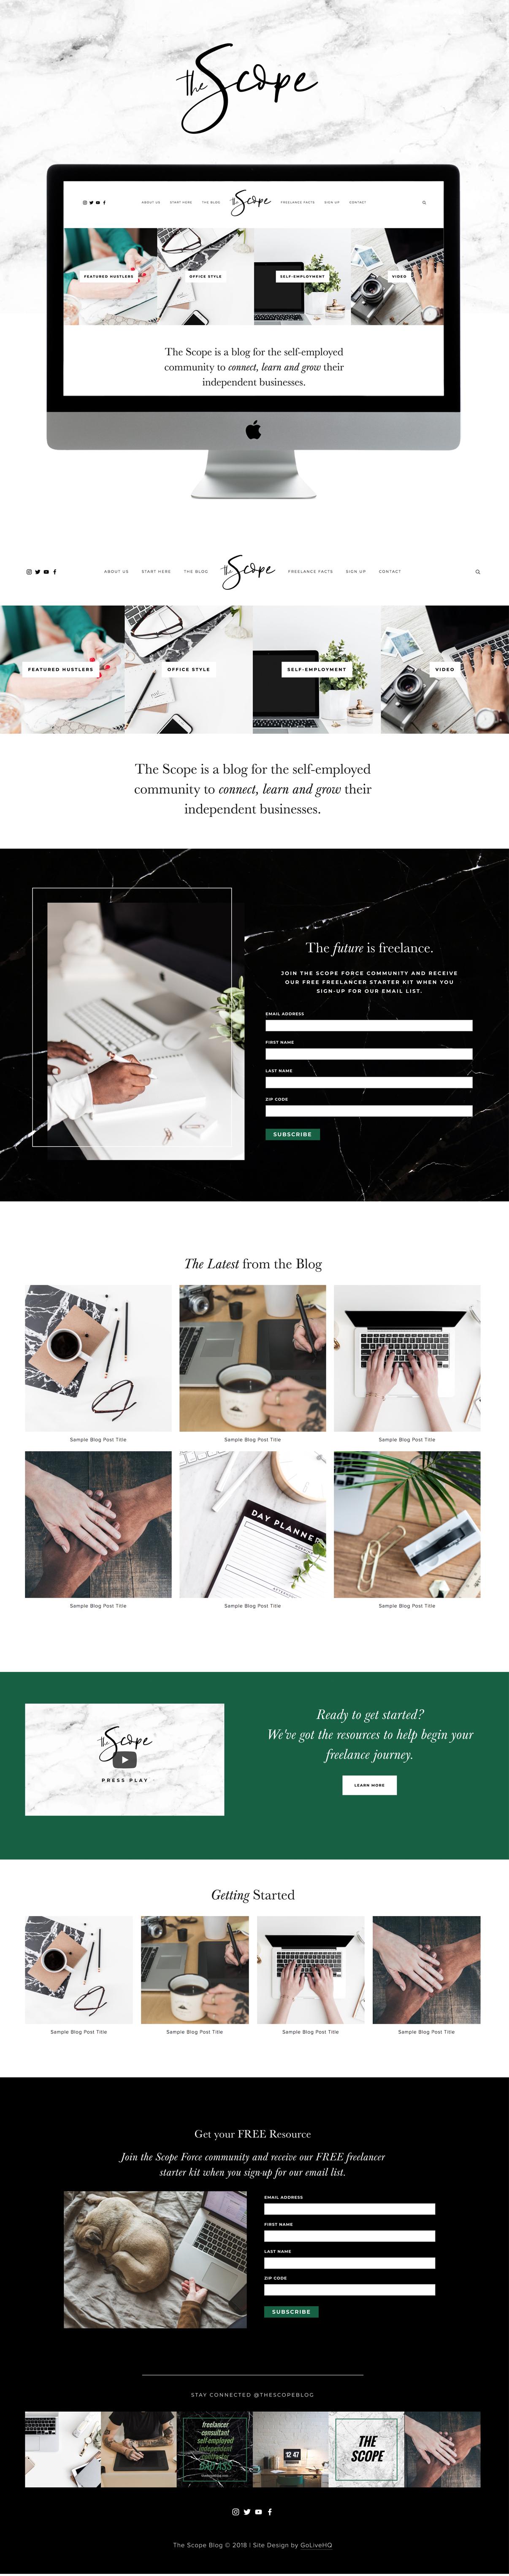 Modern, Professional Website Design for Business | Design by Go Live HQ